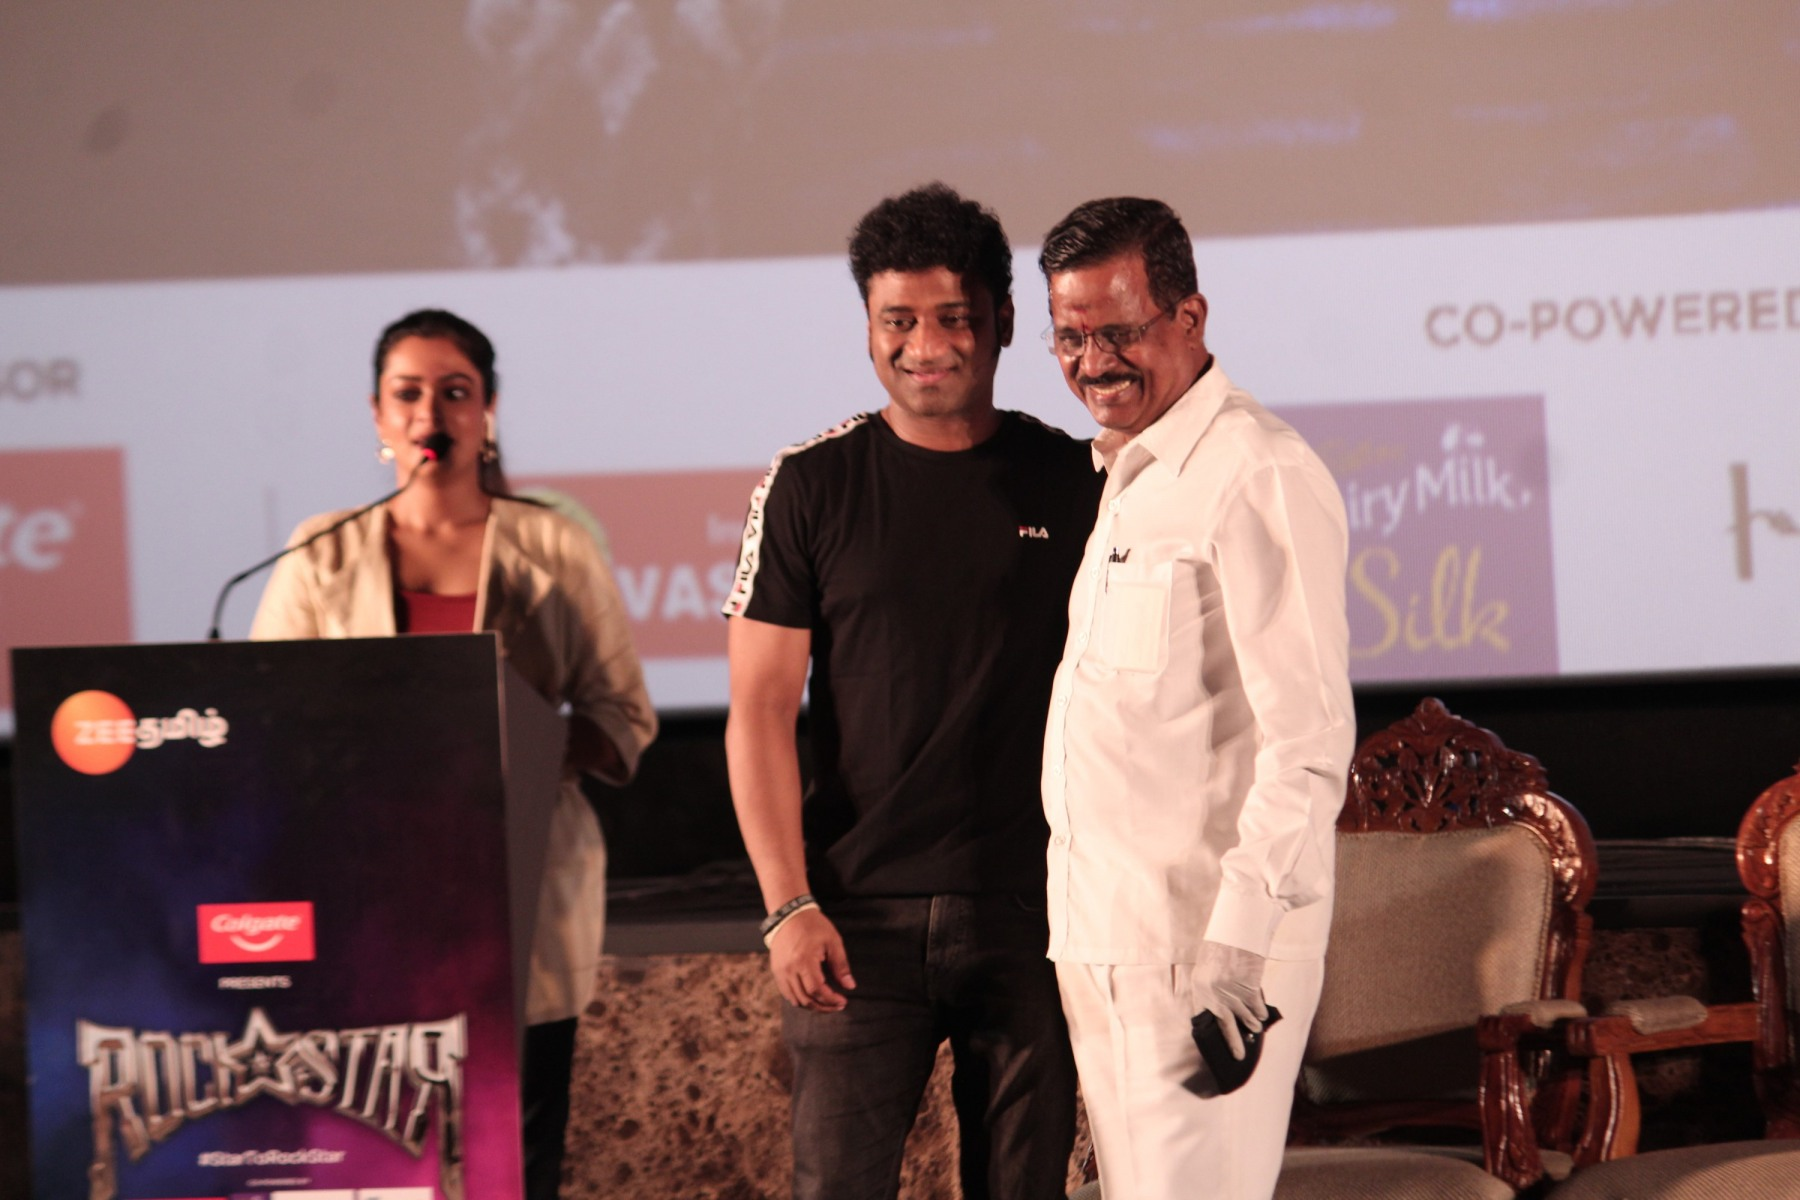 Rockstar-Music-reality-show-in-Zee-Tamil-36